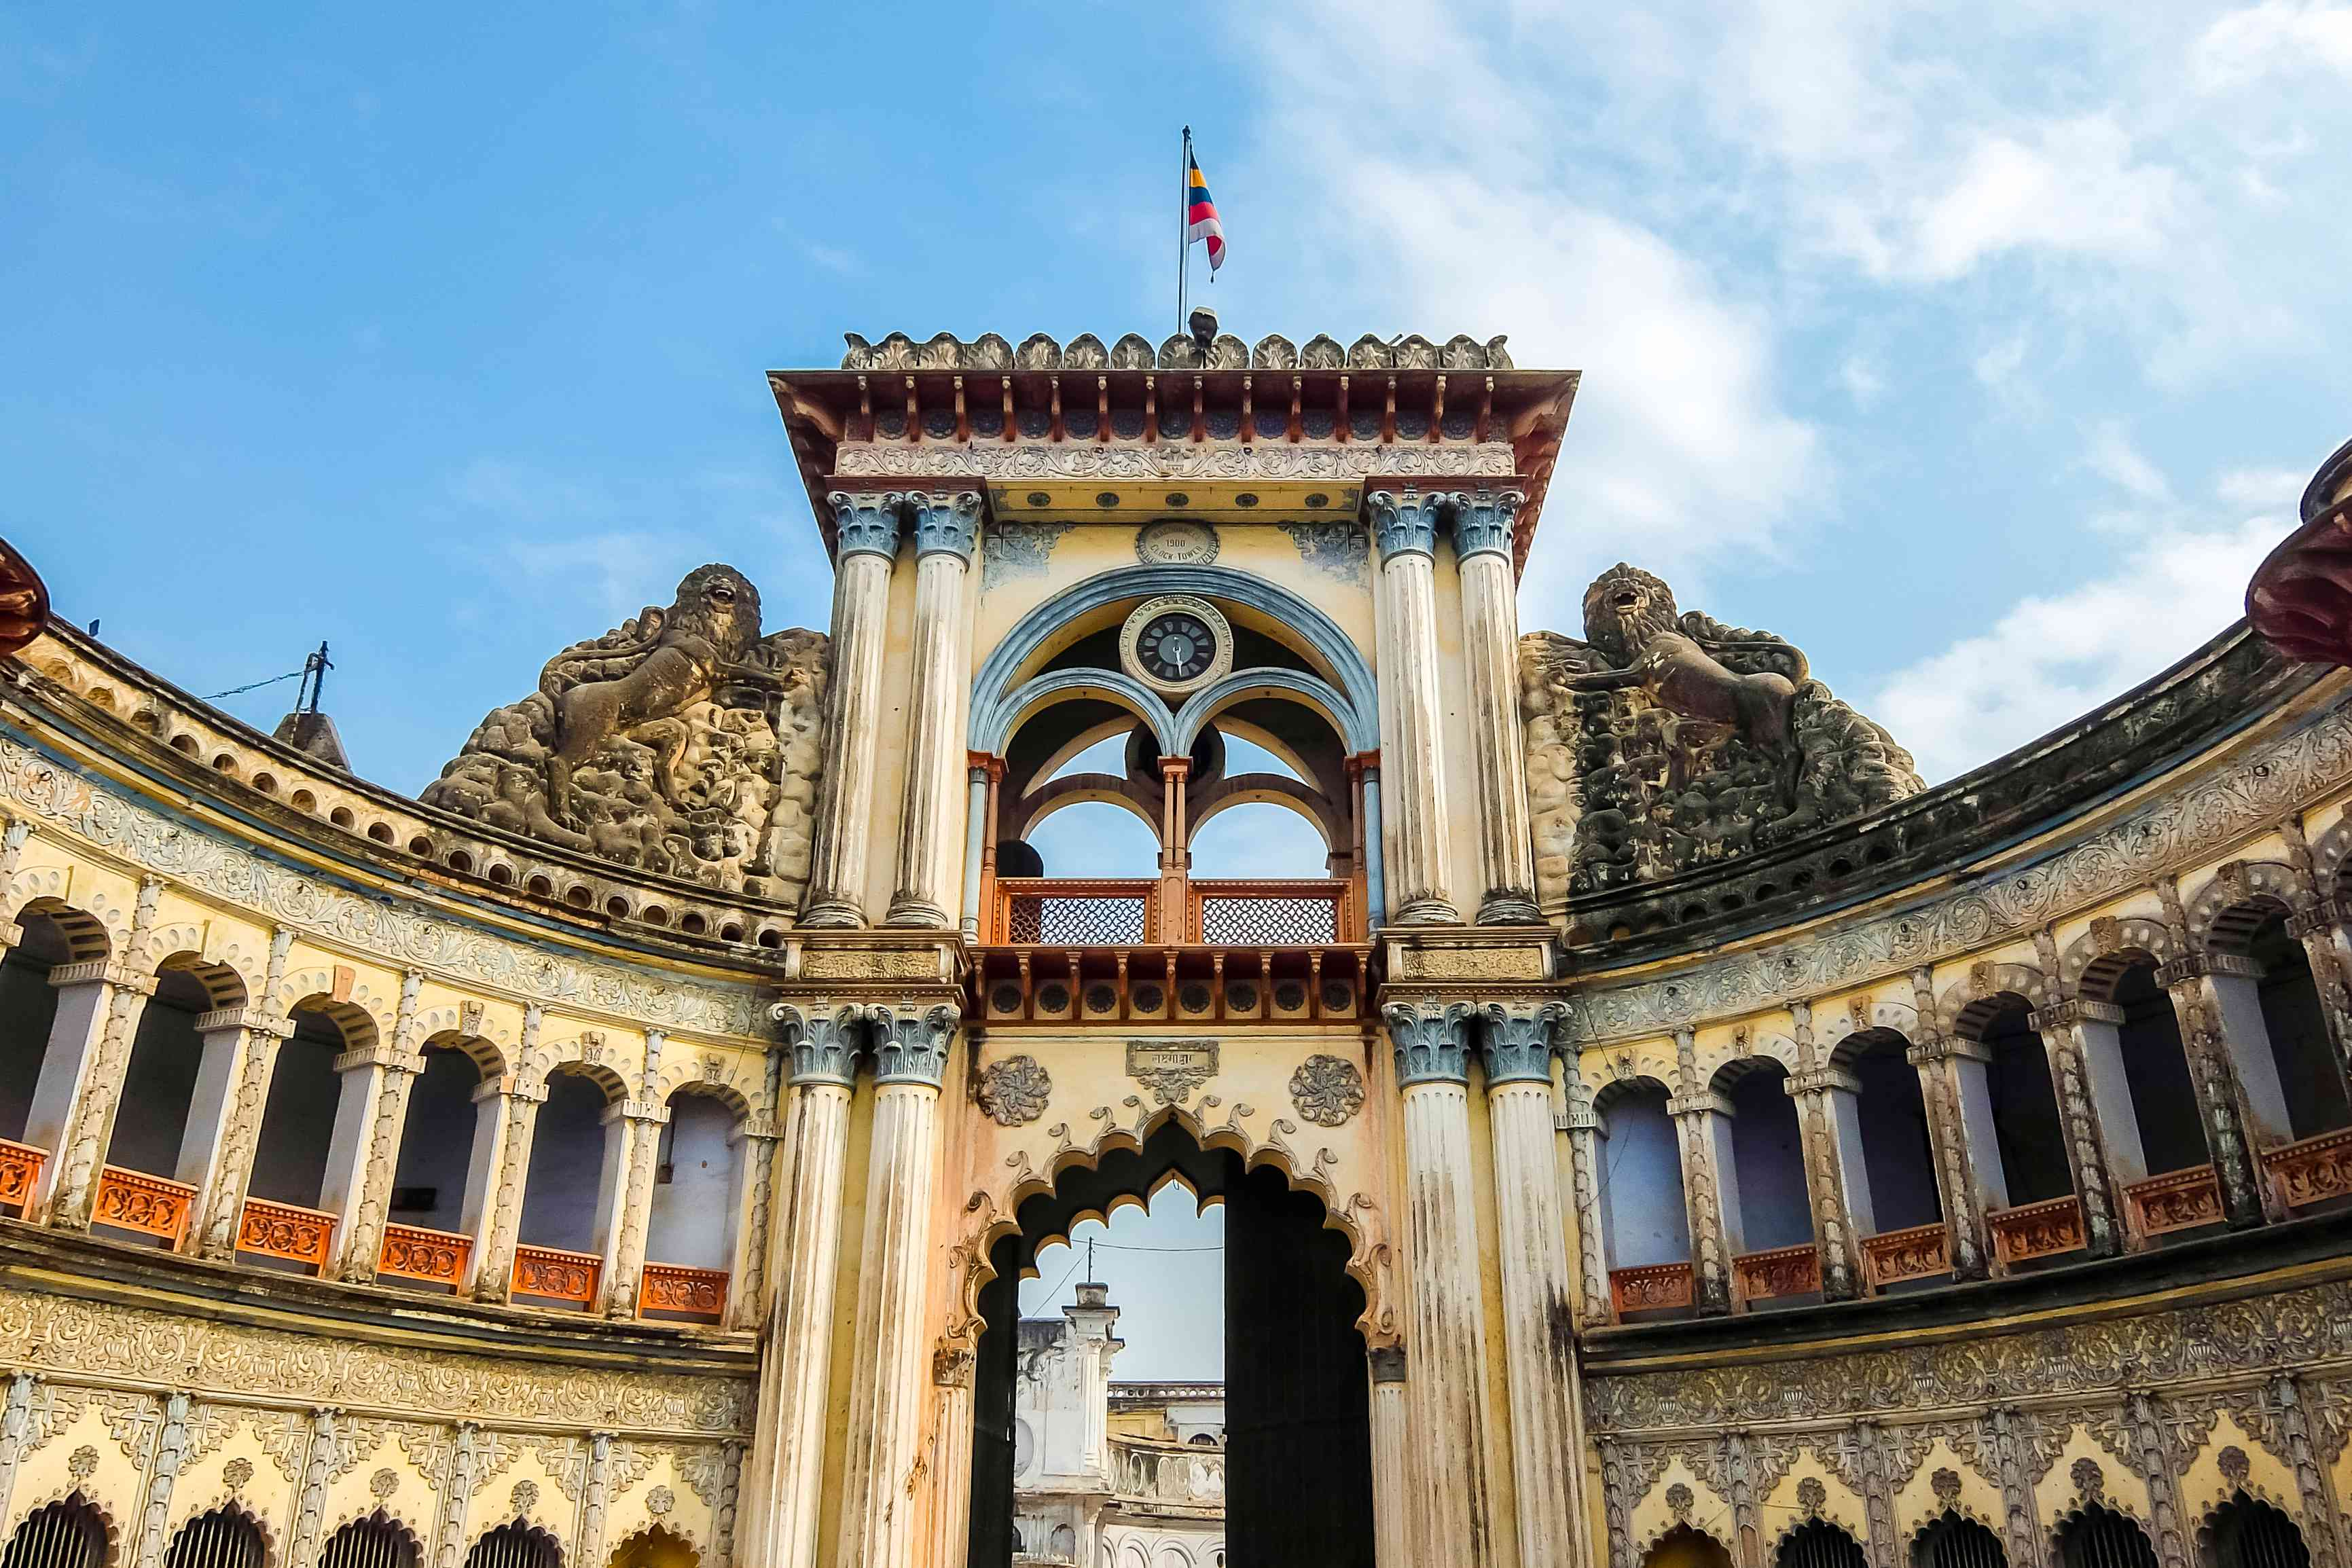 Arquitectura de Ayodhya, India.